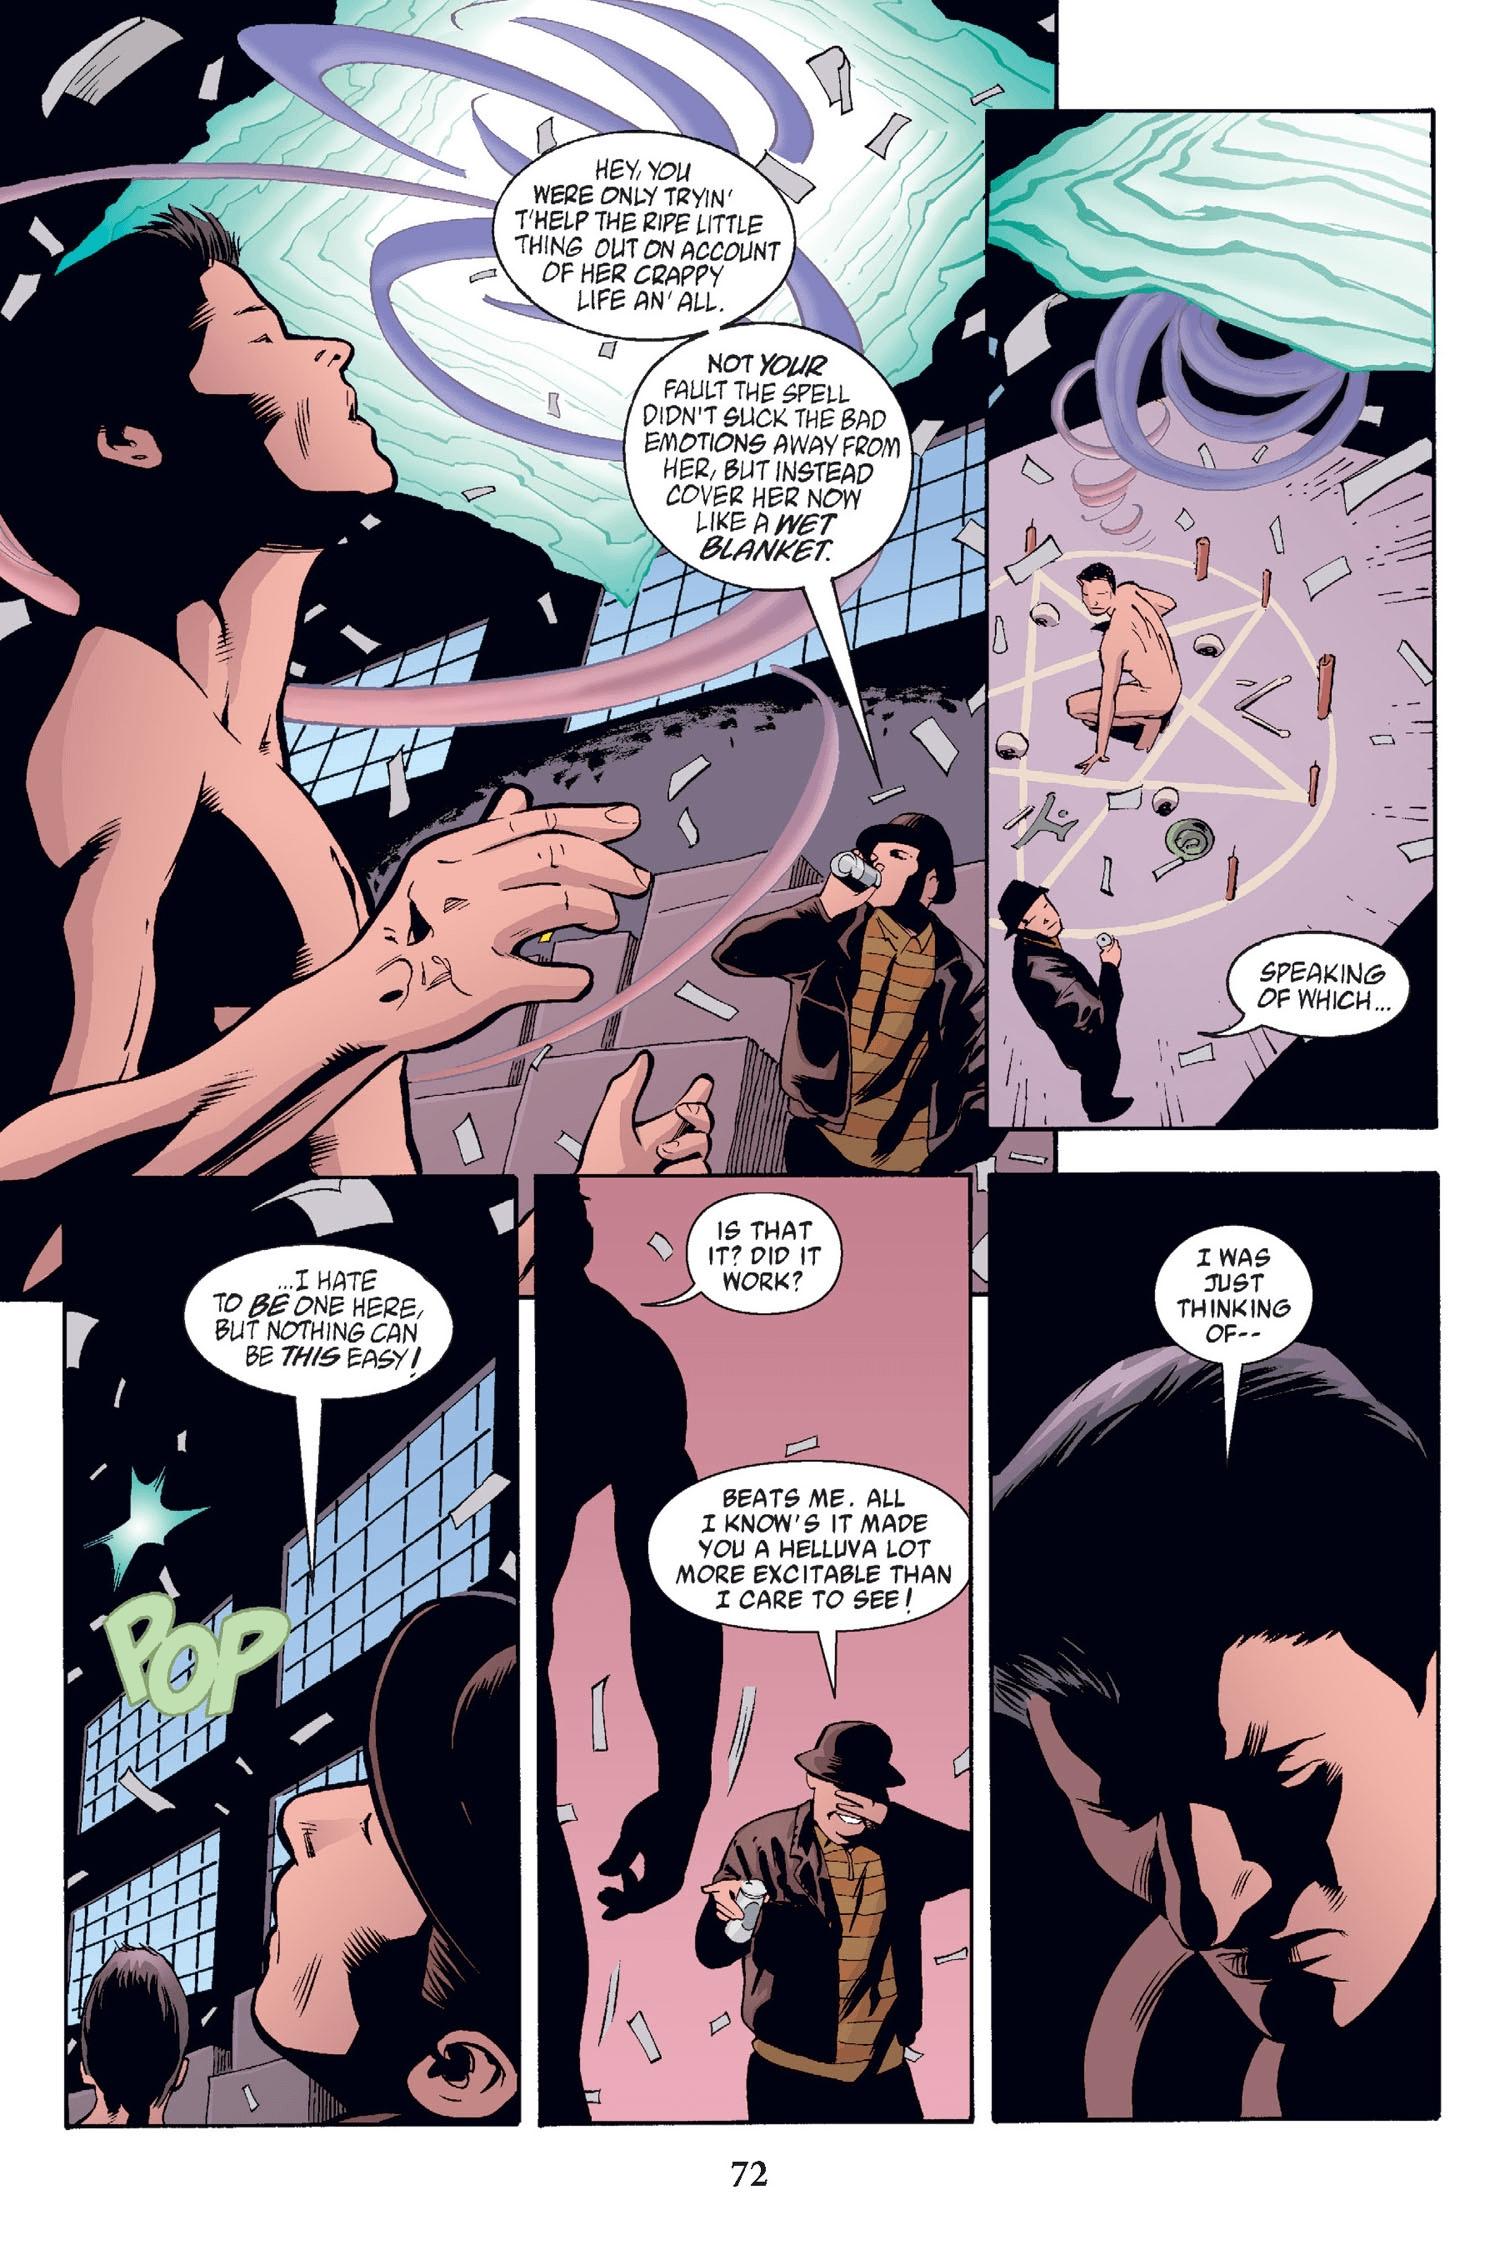 Read online Buffy the Vampire Slayer: Omnibus comic -  Issue # TPB 2 - 70